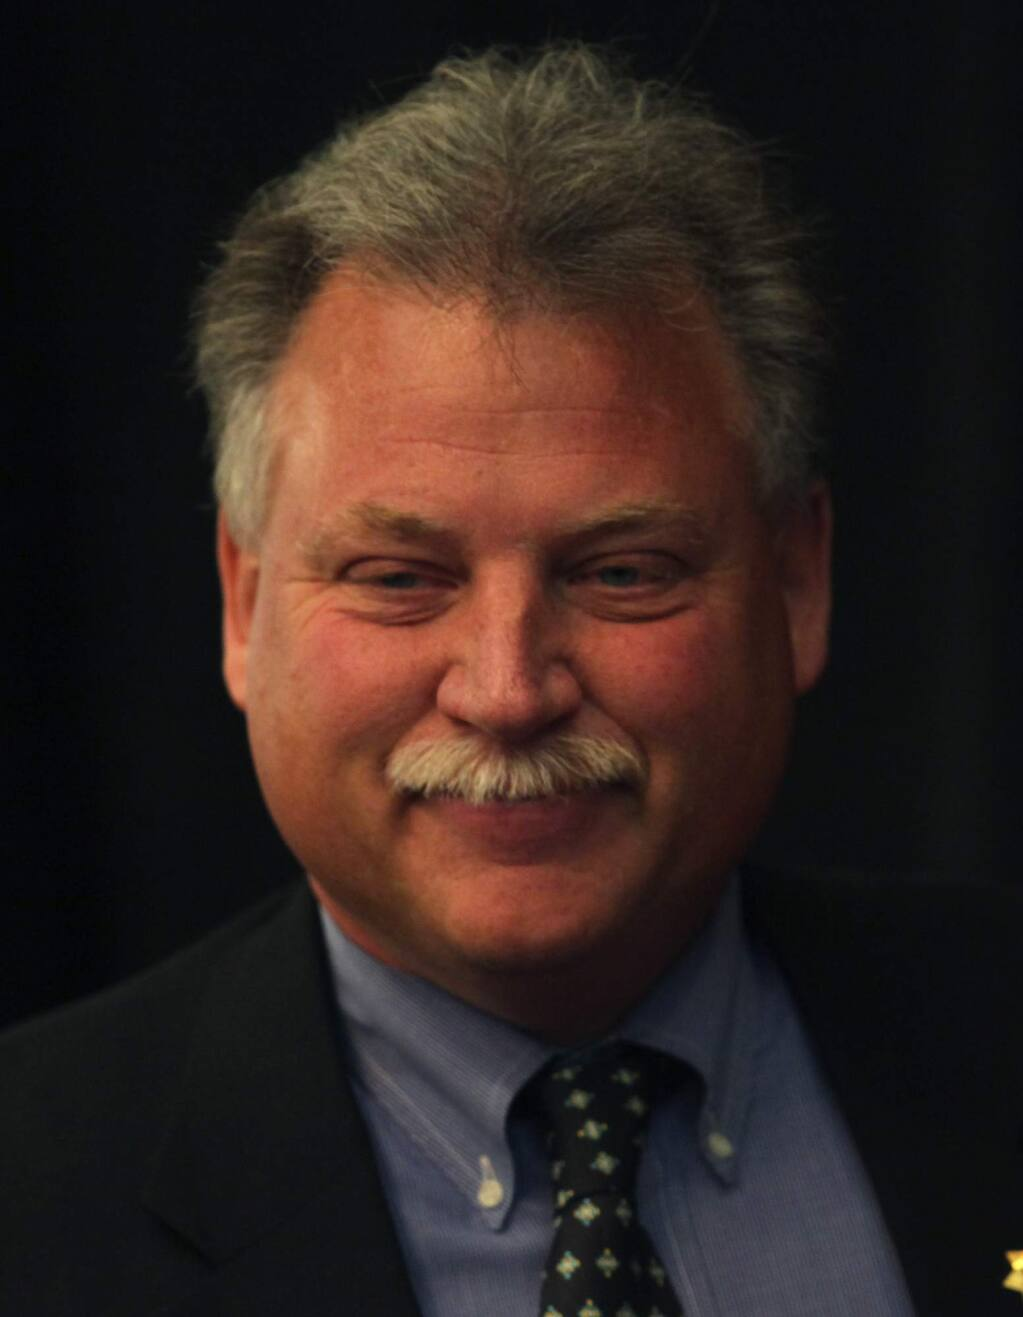 Mendocino County Sheriff Tom Allman. (Kent Porter / Press Democrat) 2010